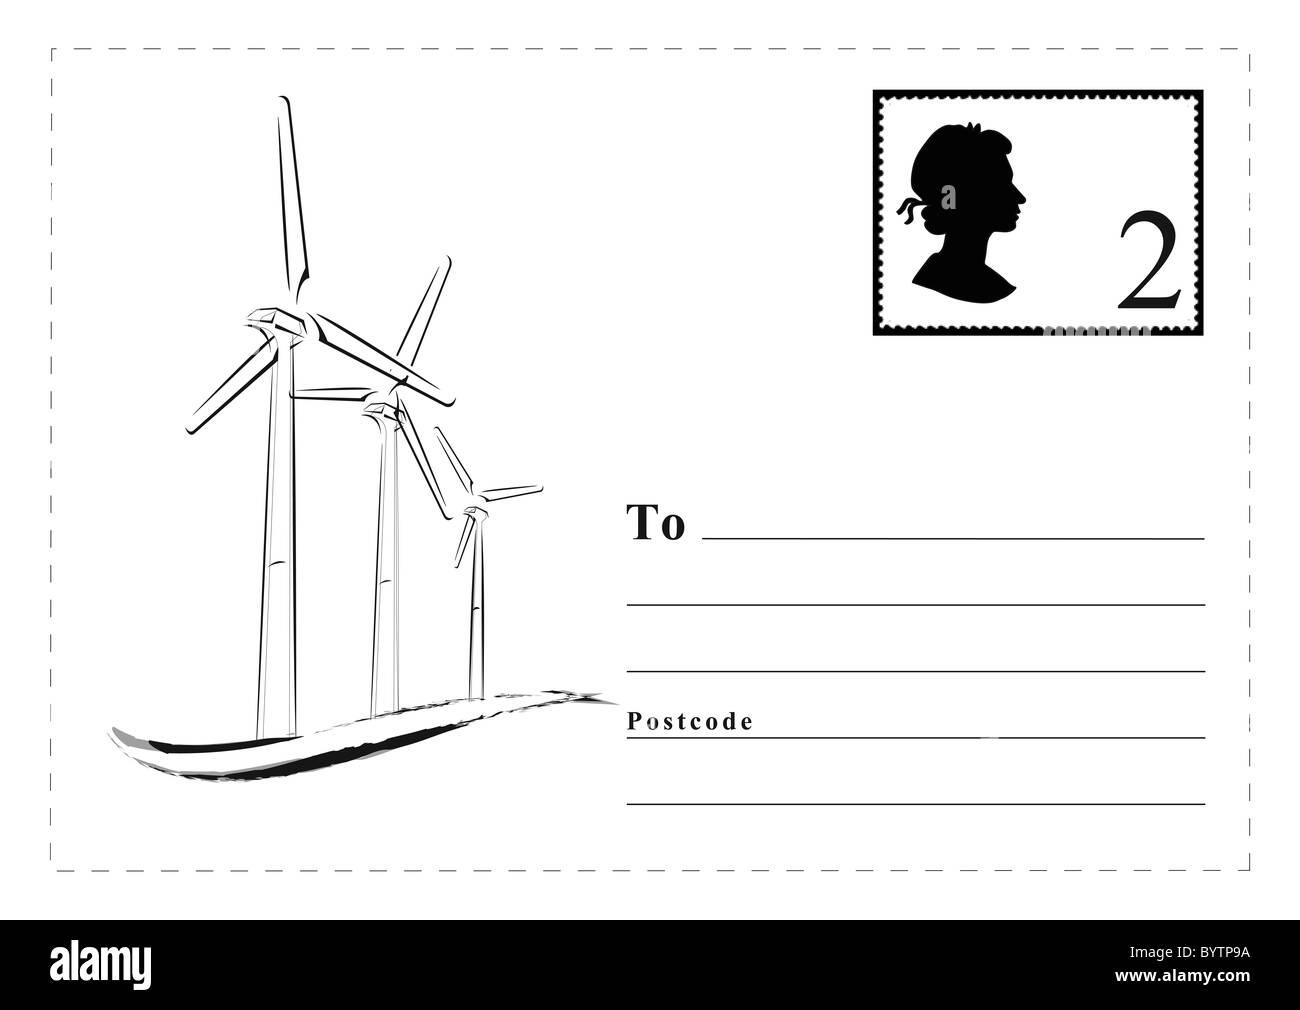 Plantilla de tarjeta postal en blanco y negro, 2ra clase sello silueta de Reina, esbozó observó espacios, Imagen De Stock